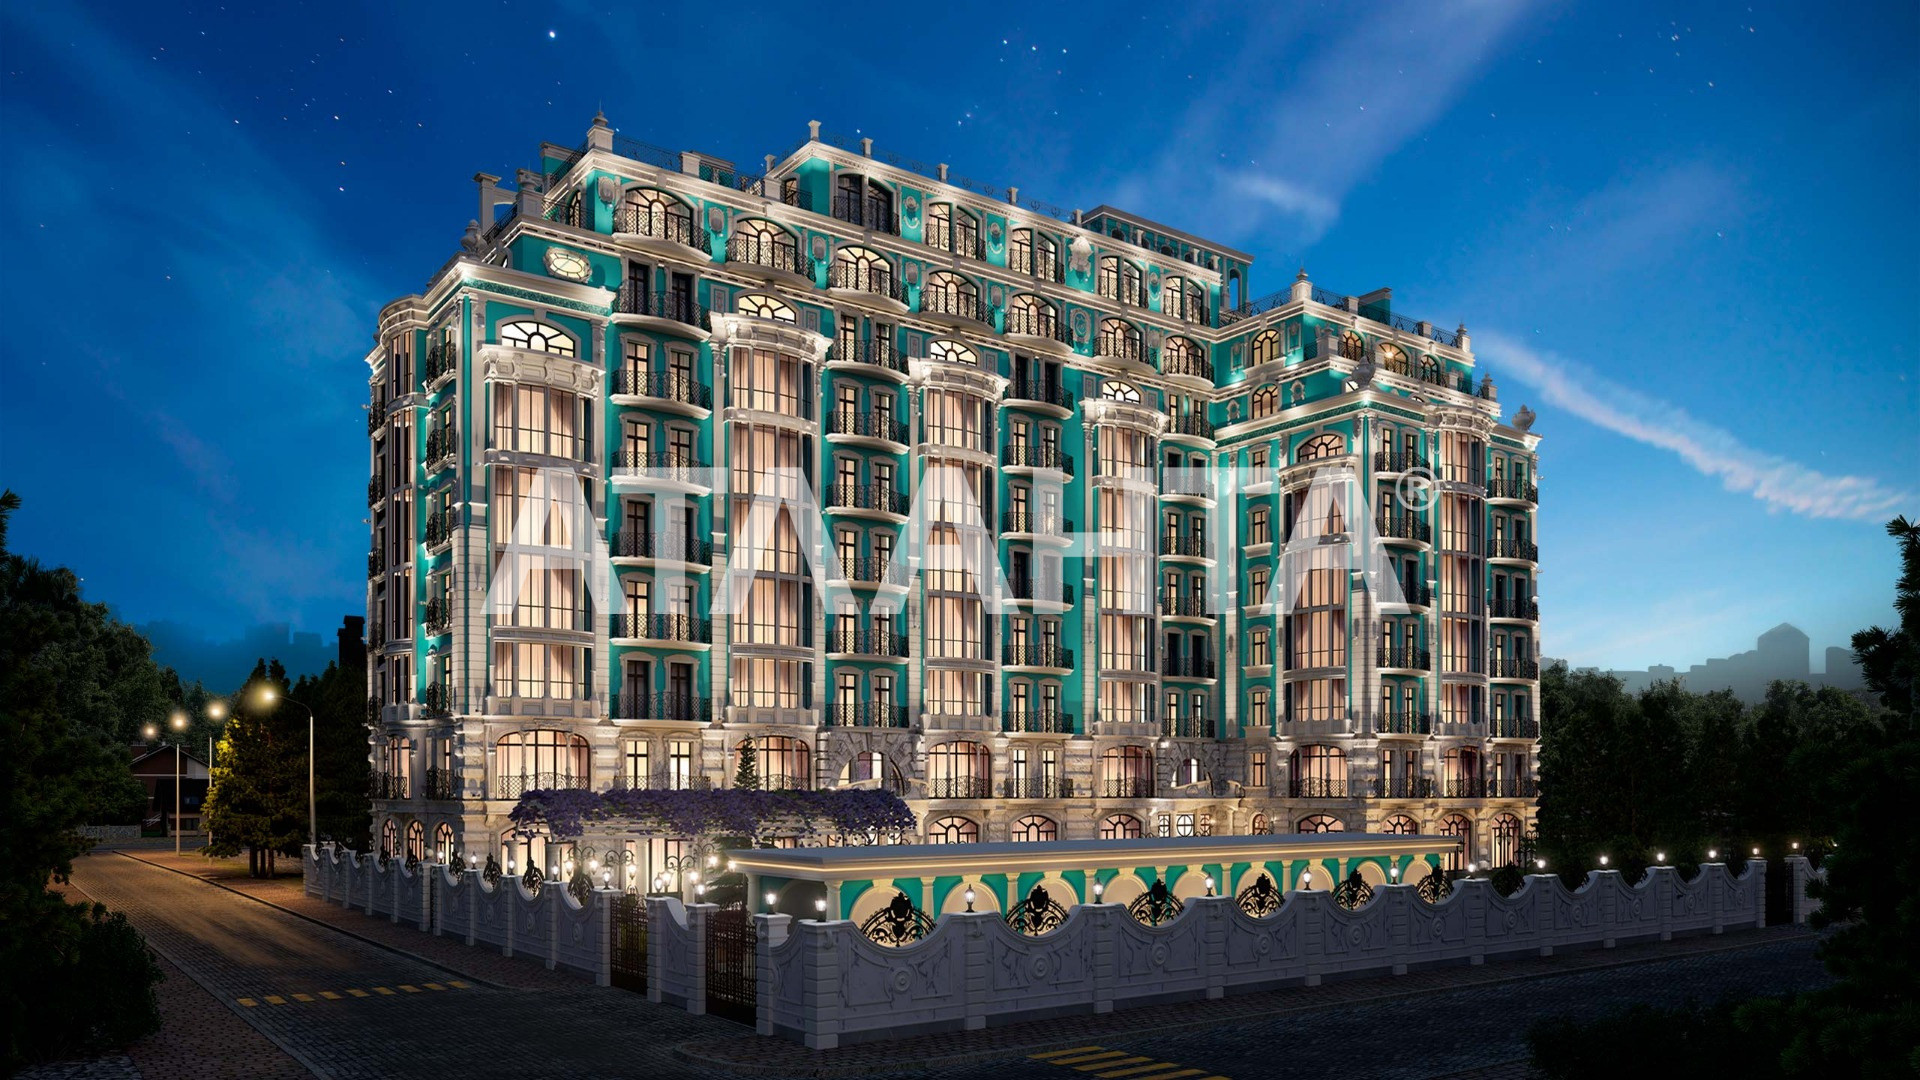 Продается 3-комнатная Квартира на ул. Французский Бул. (Пролетарский Бул.) — 523 600 у.е. (фото №3)